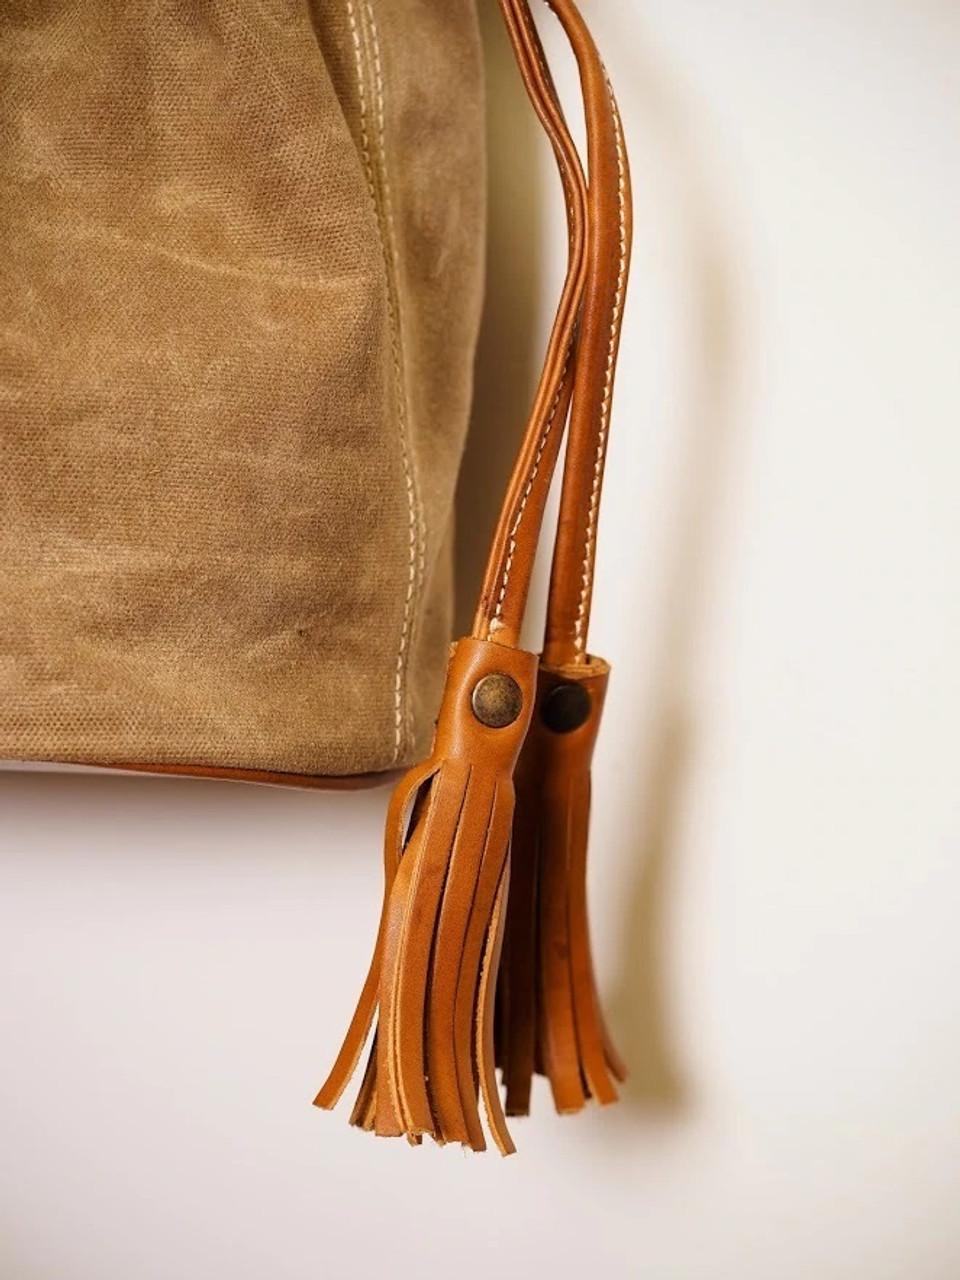 Correa Canvas Bucket Bag in Indio Whiskey & Tan